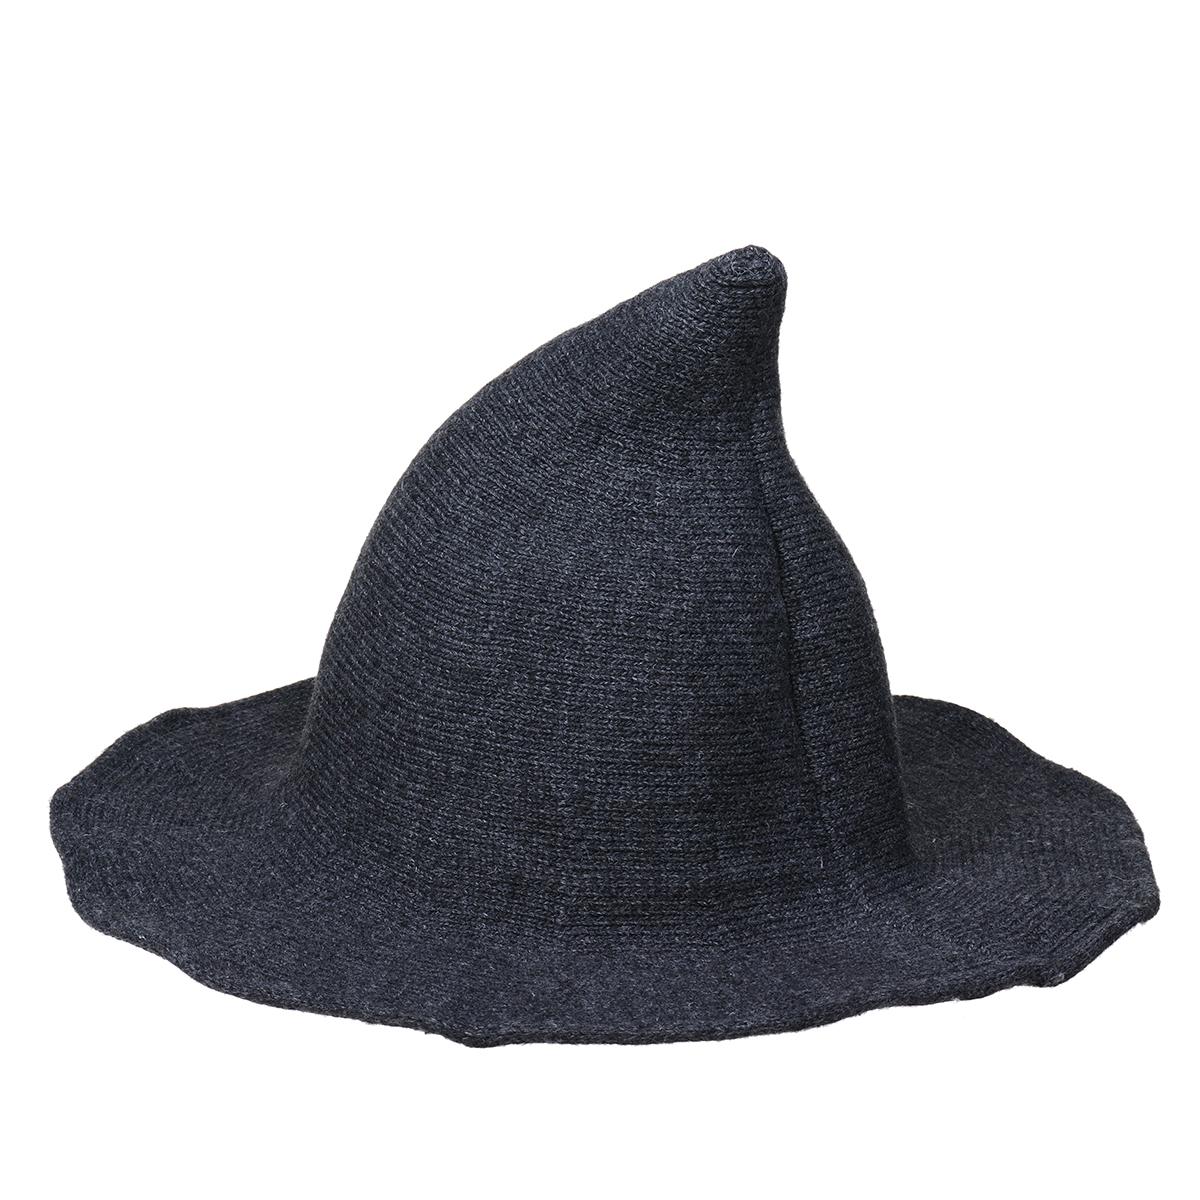 Halloween Party Spire Hat Witch Magic Hat Autumn Winter Knit Hat